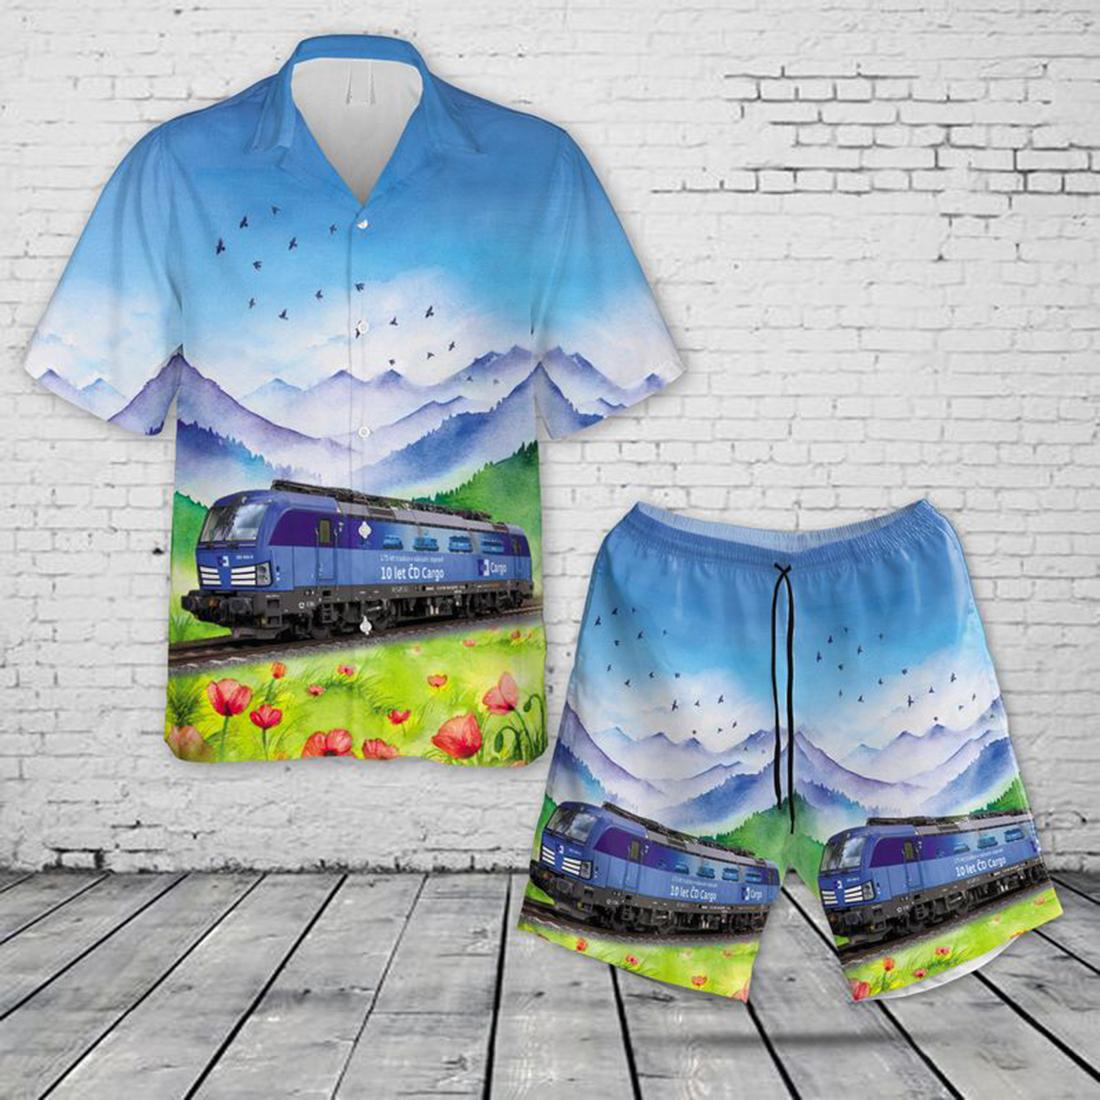 Czech Republic Ceske Drahy CDC 383 Multi-System Electric Locomotives Vectron Vetroun (Windy man) Hawaiian Shirt